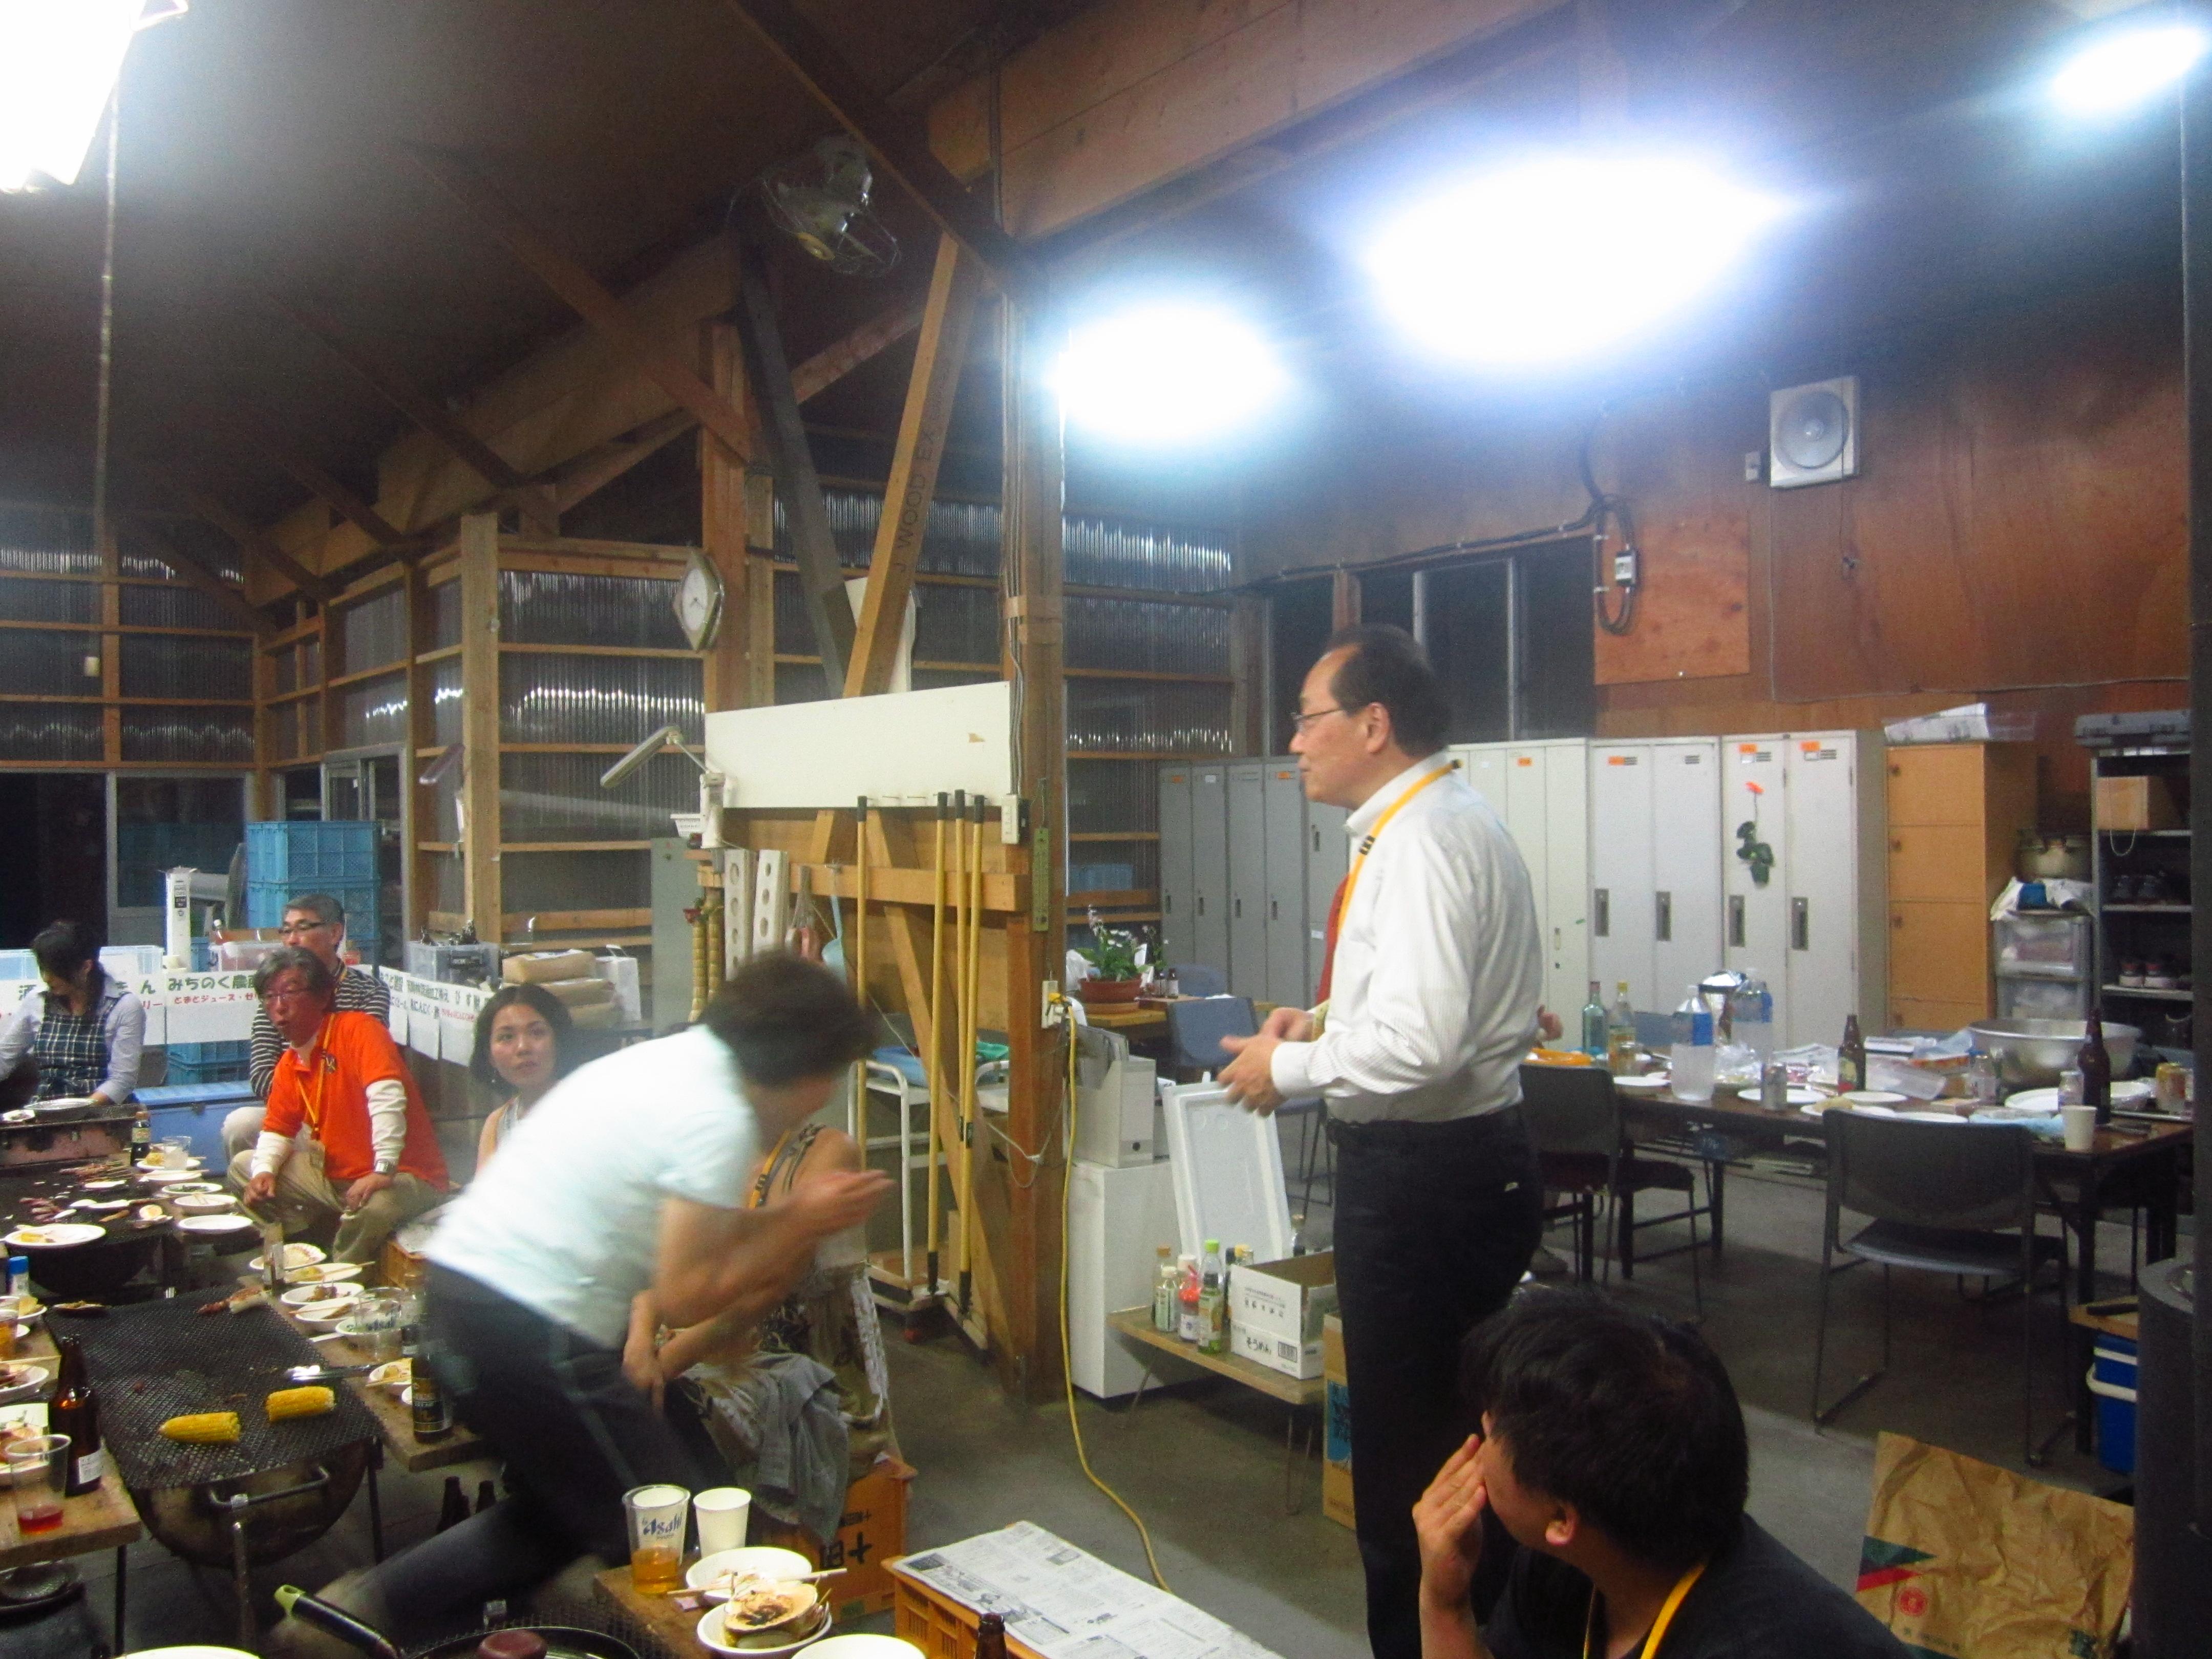 IMG 4336 - 麻布十番納涼祭り25,26日(七戸町出店)